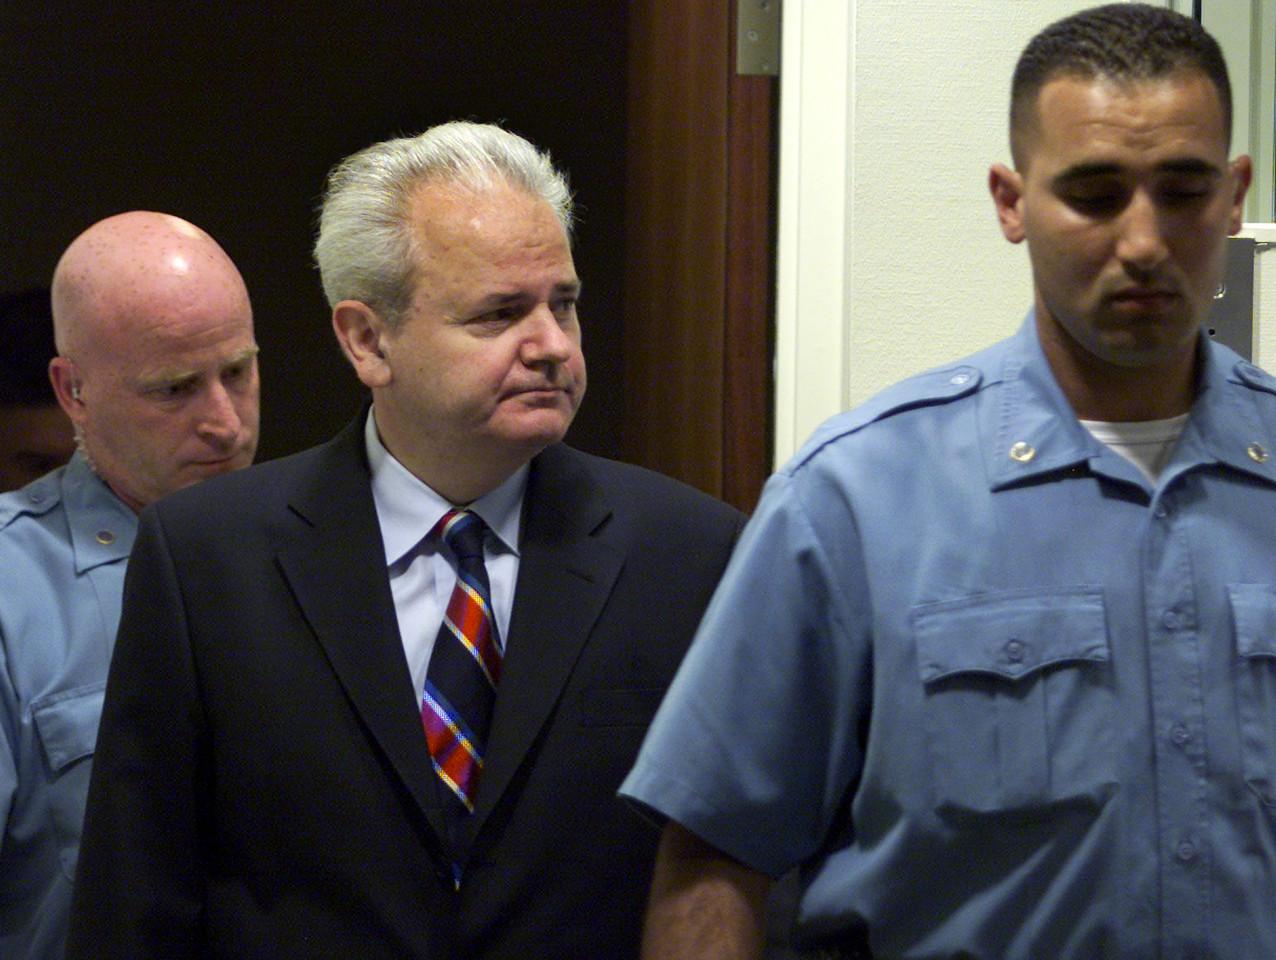 Slobodan Milosevic_prisão 2001-04-01